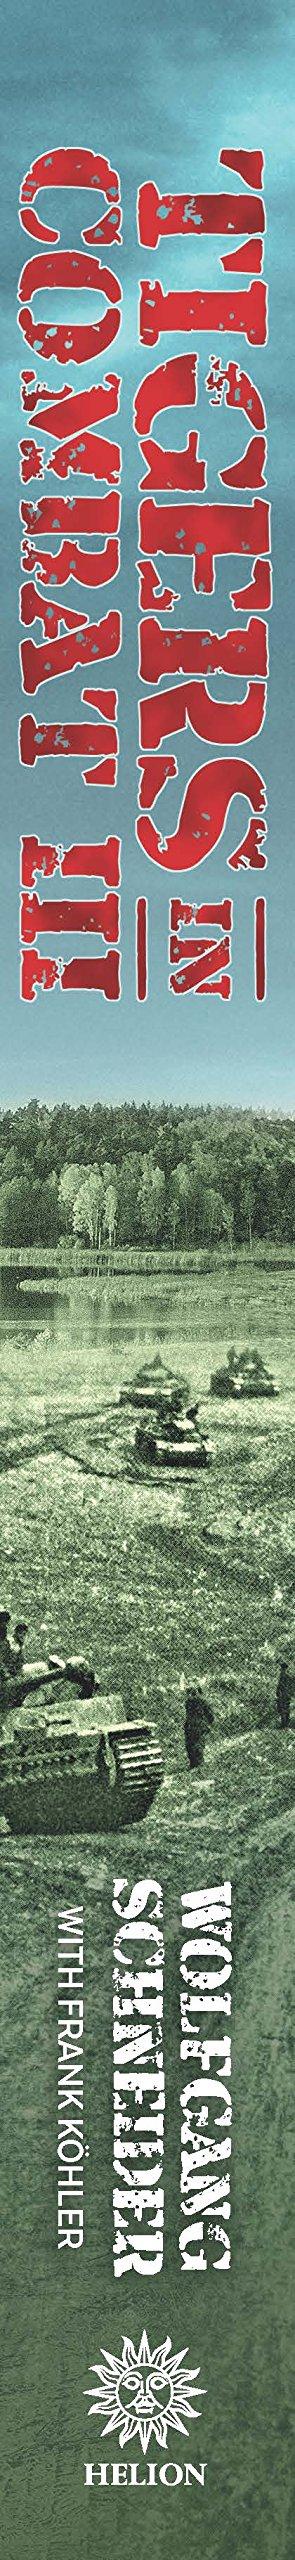 Tigers In Combat: Volume III: Operation, Training, Tactics